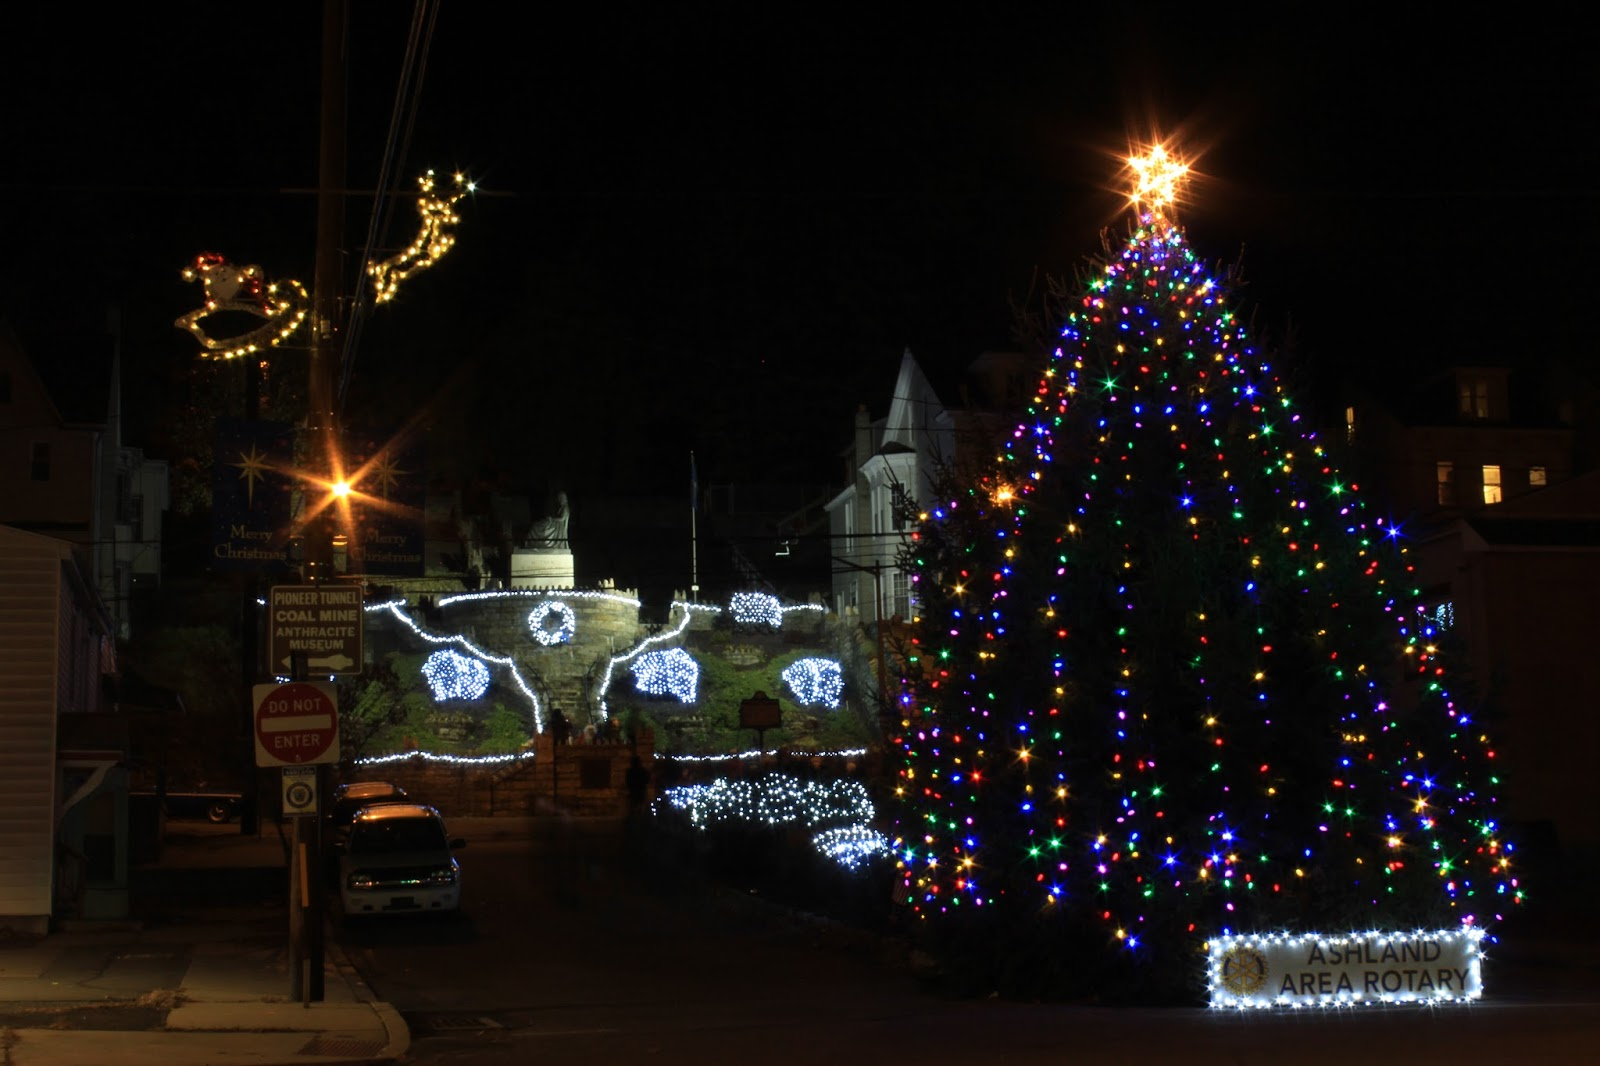 Ashland Christmas Trees.Skook News Santa Claus Arrives And Lights Christmas Tree In